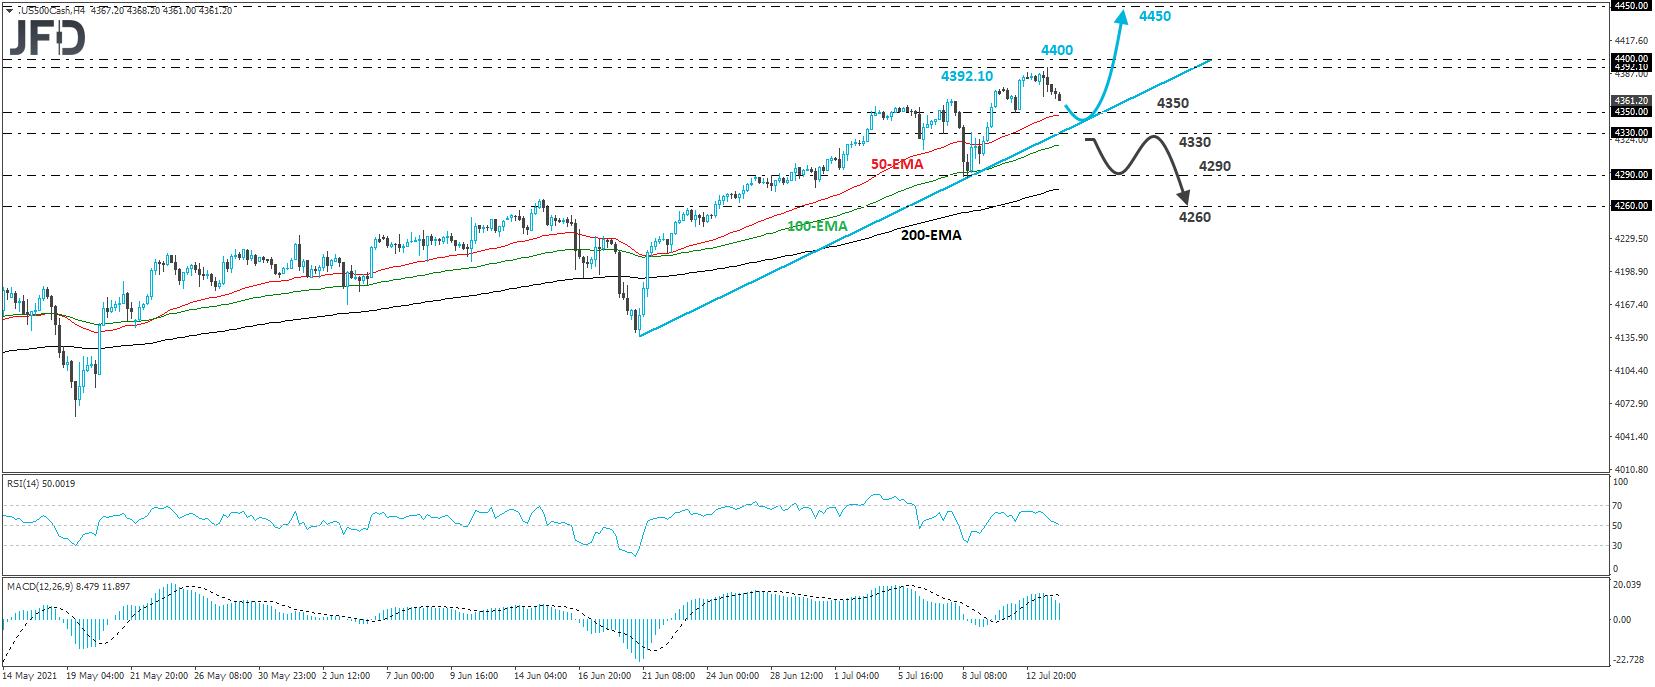 S&P 500 cash index 4-horu chart technical analysis